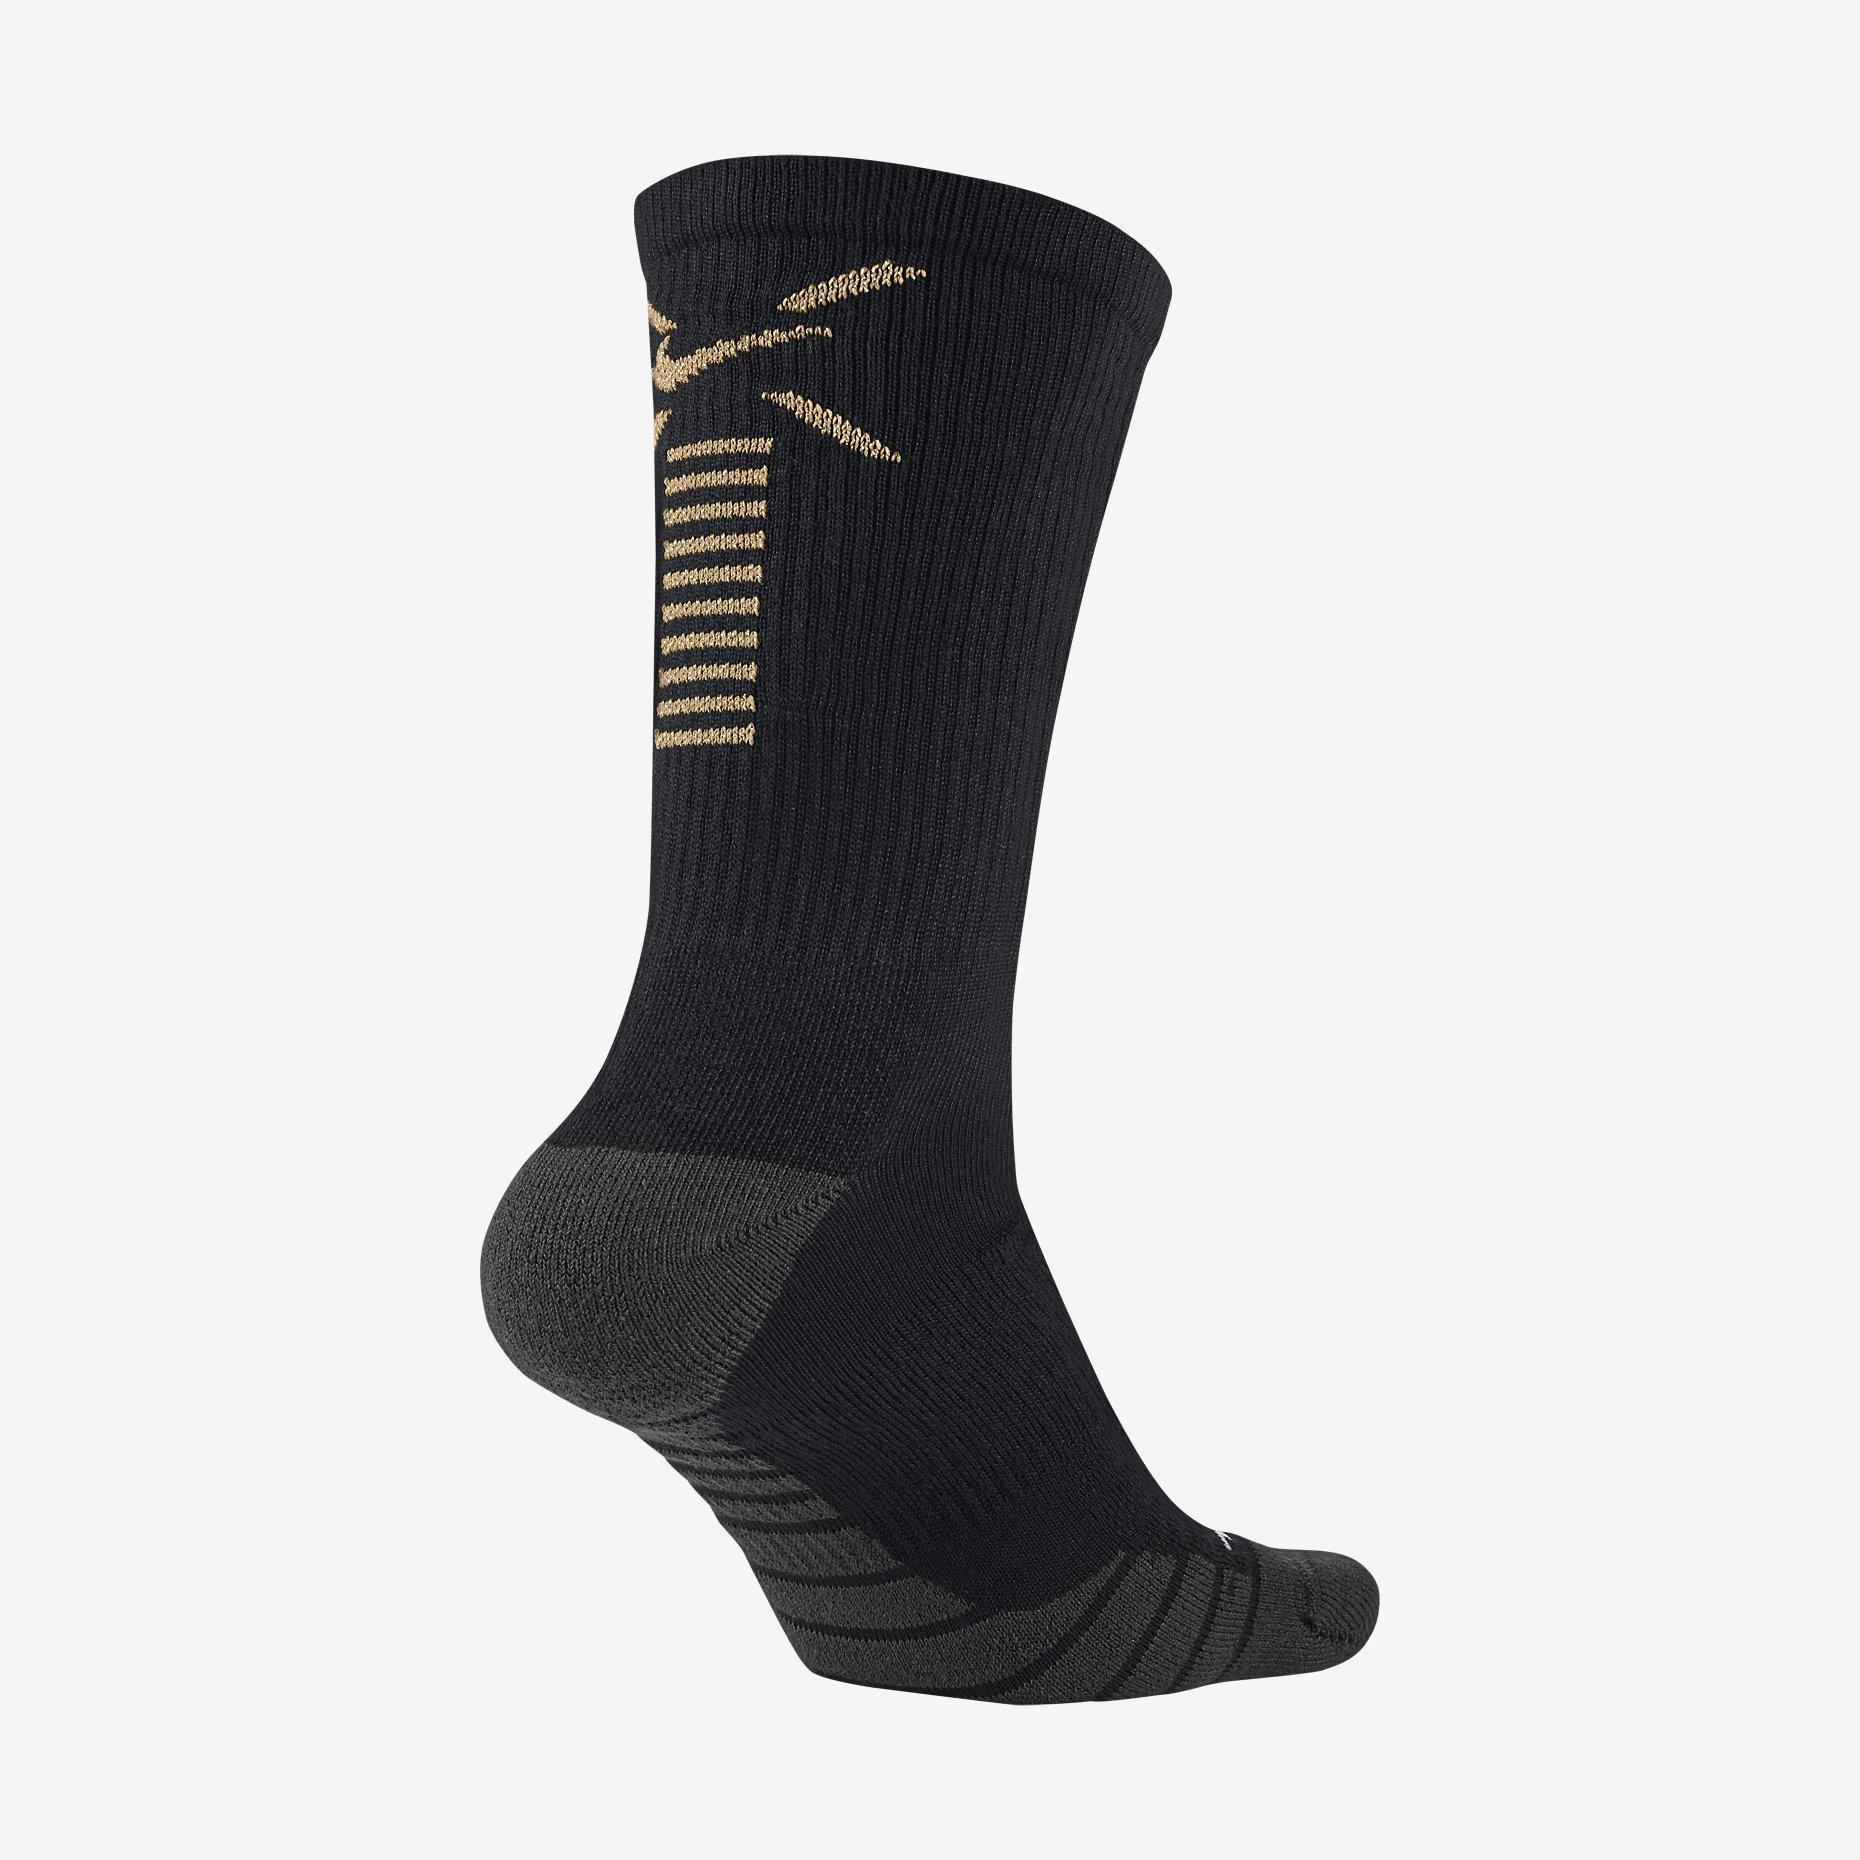 dry-cushion-crew-training-socks